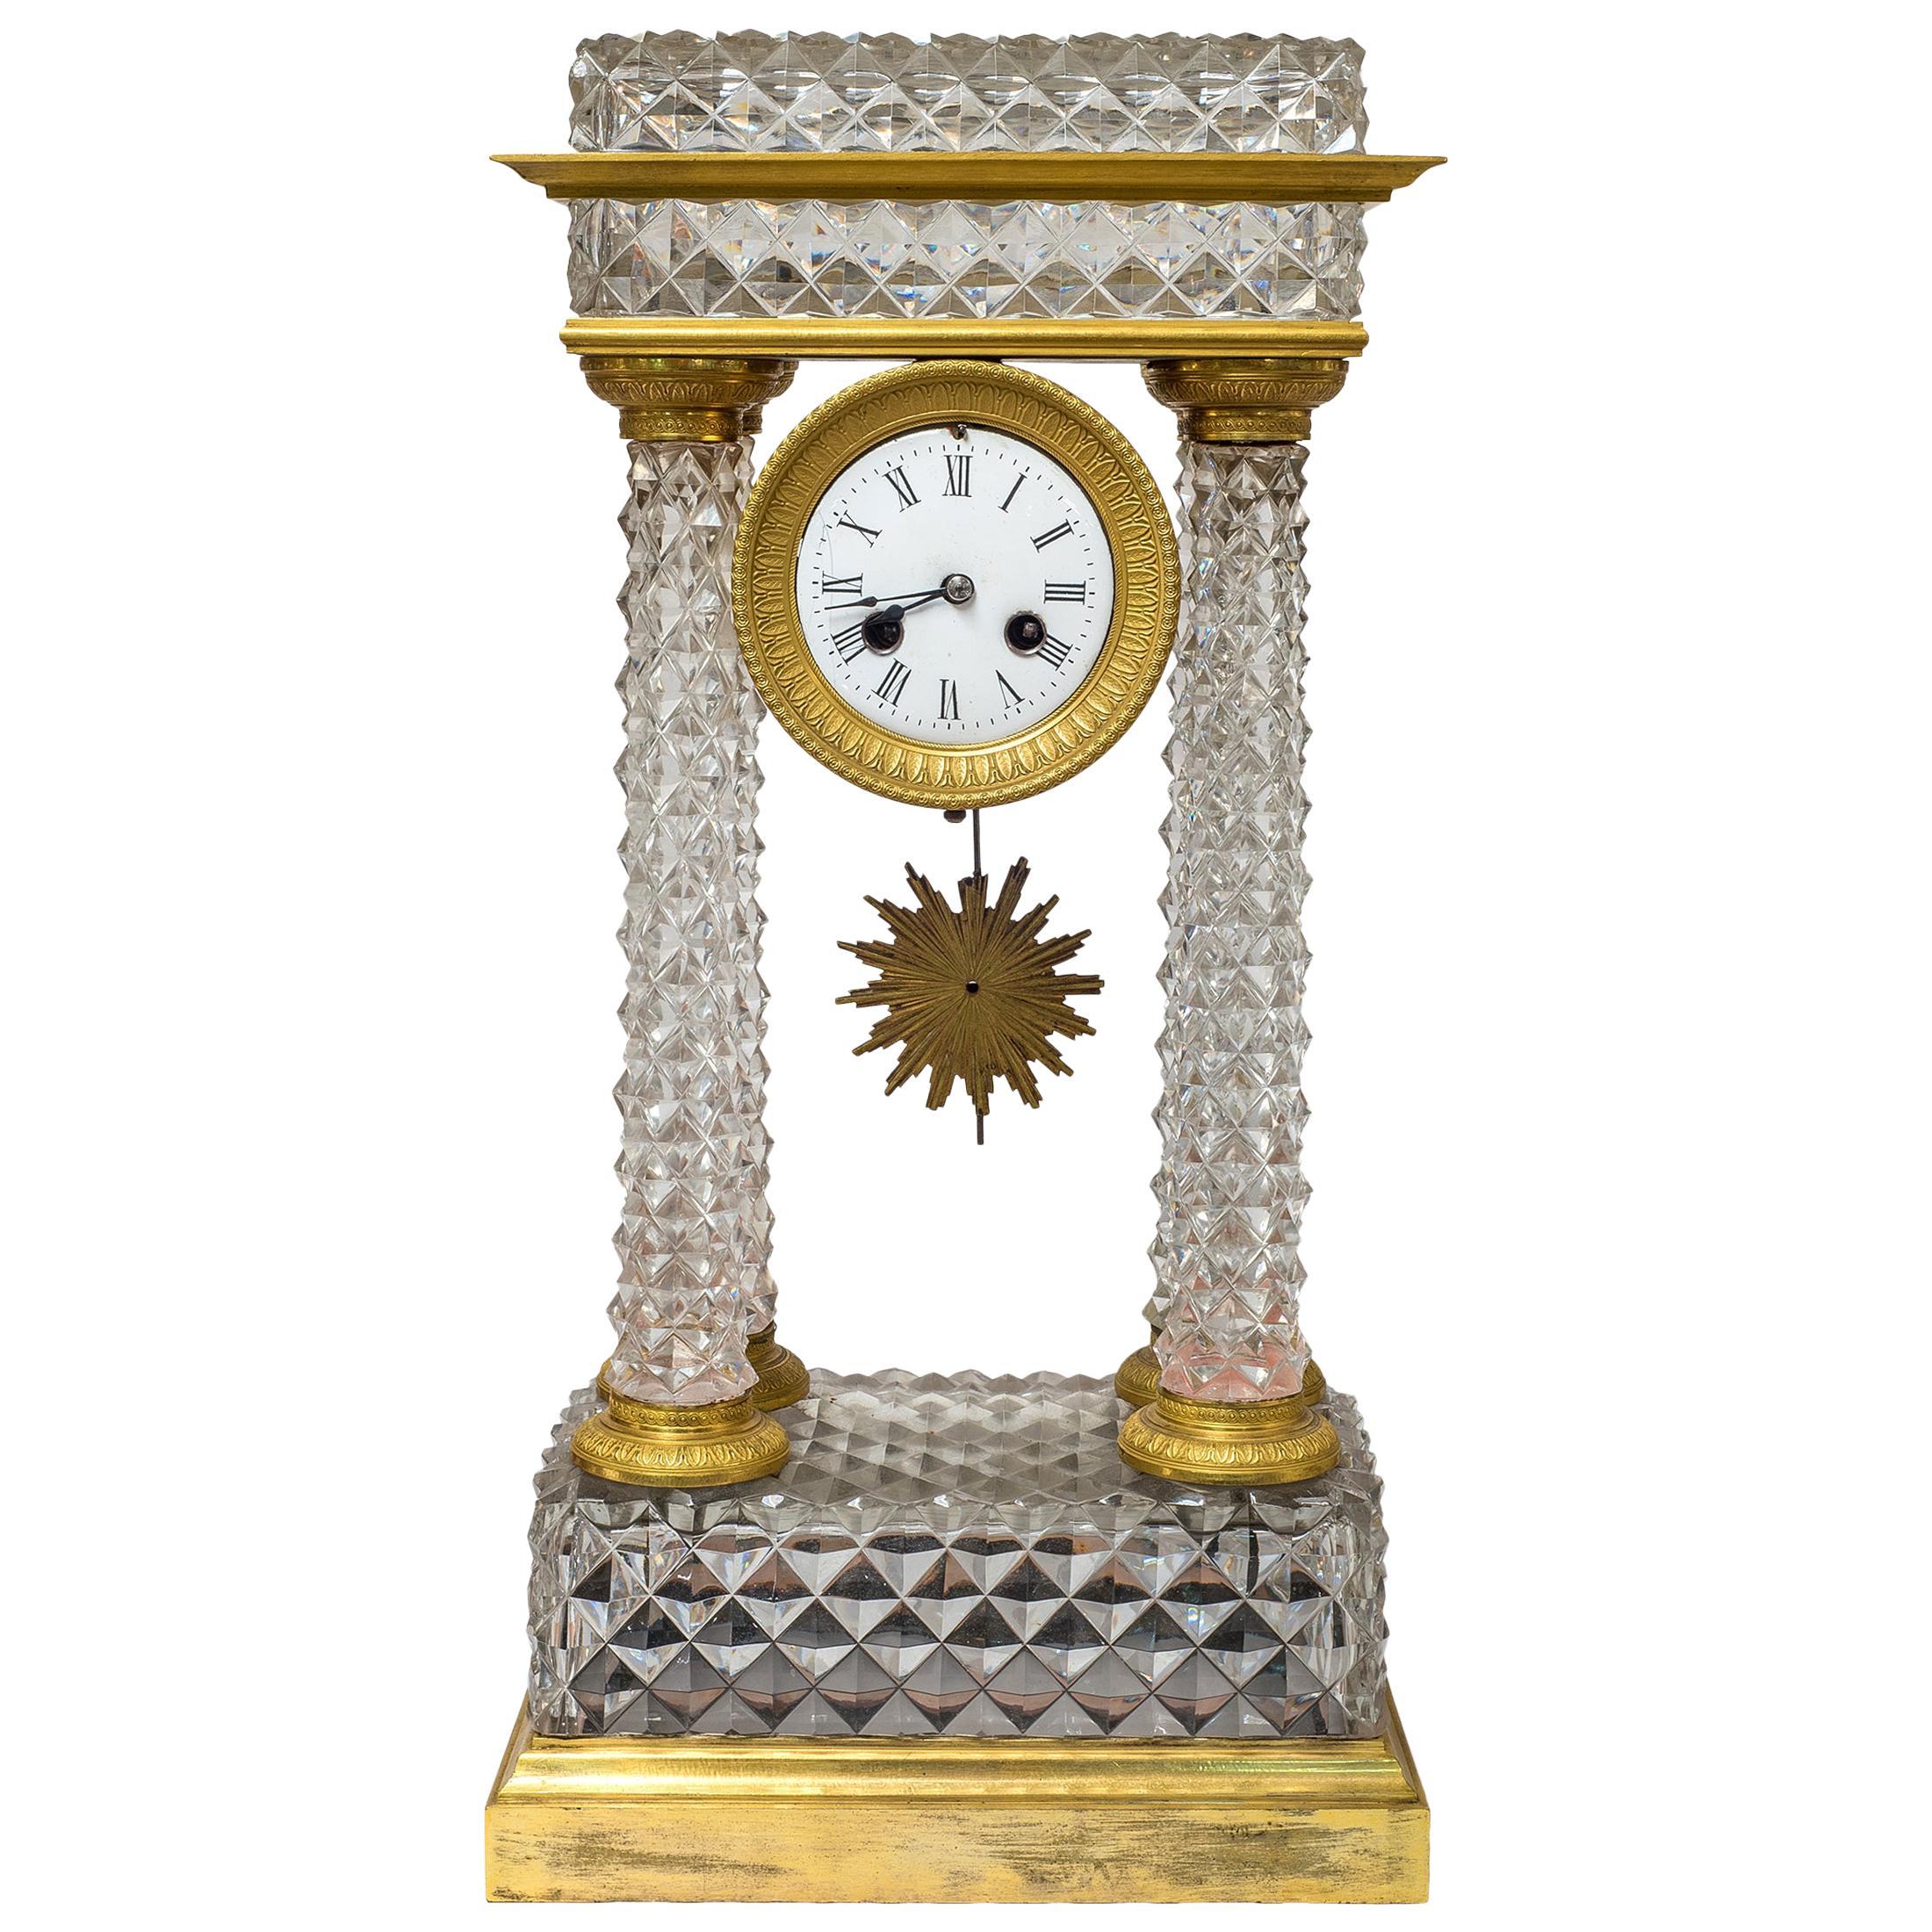 French Charles X Ormolu and Cut-Glass Portico Mantel Clock